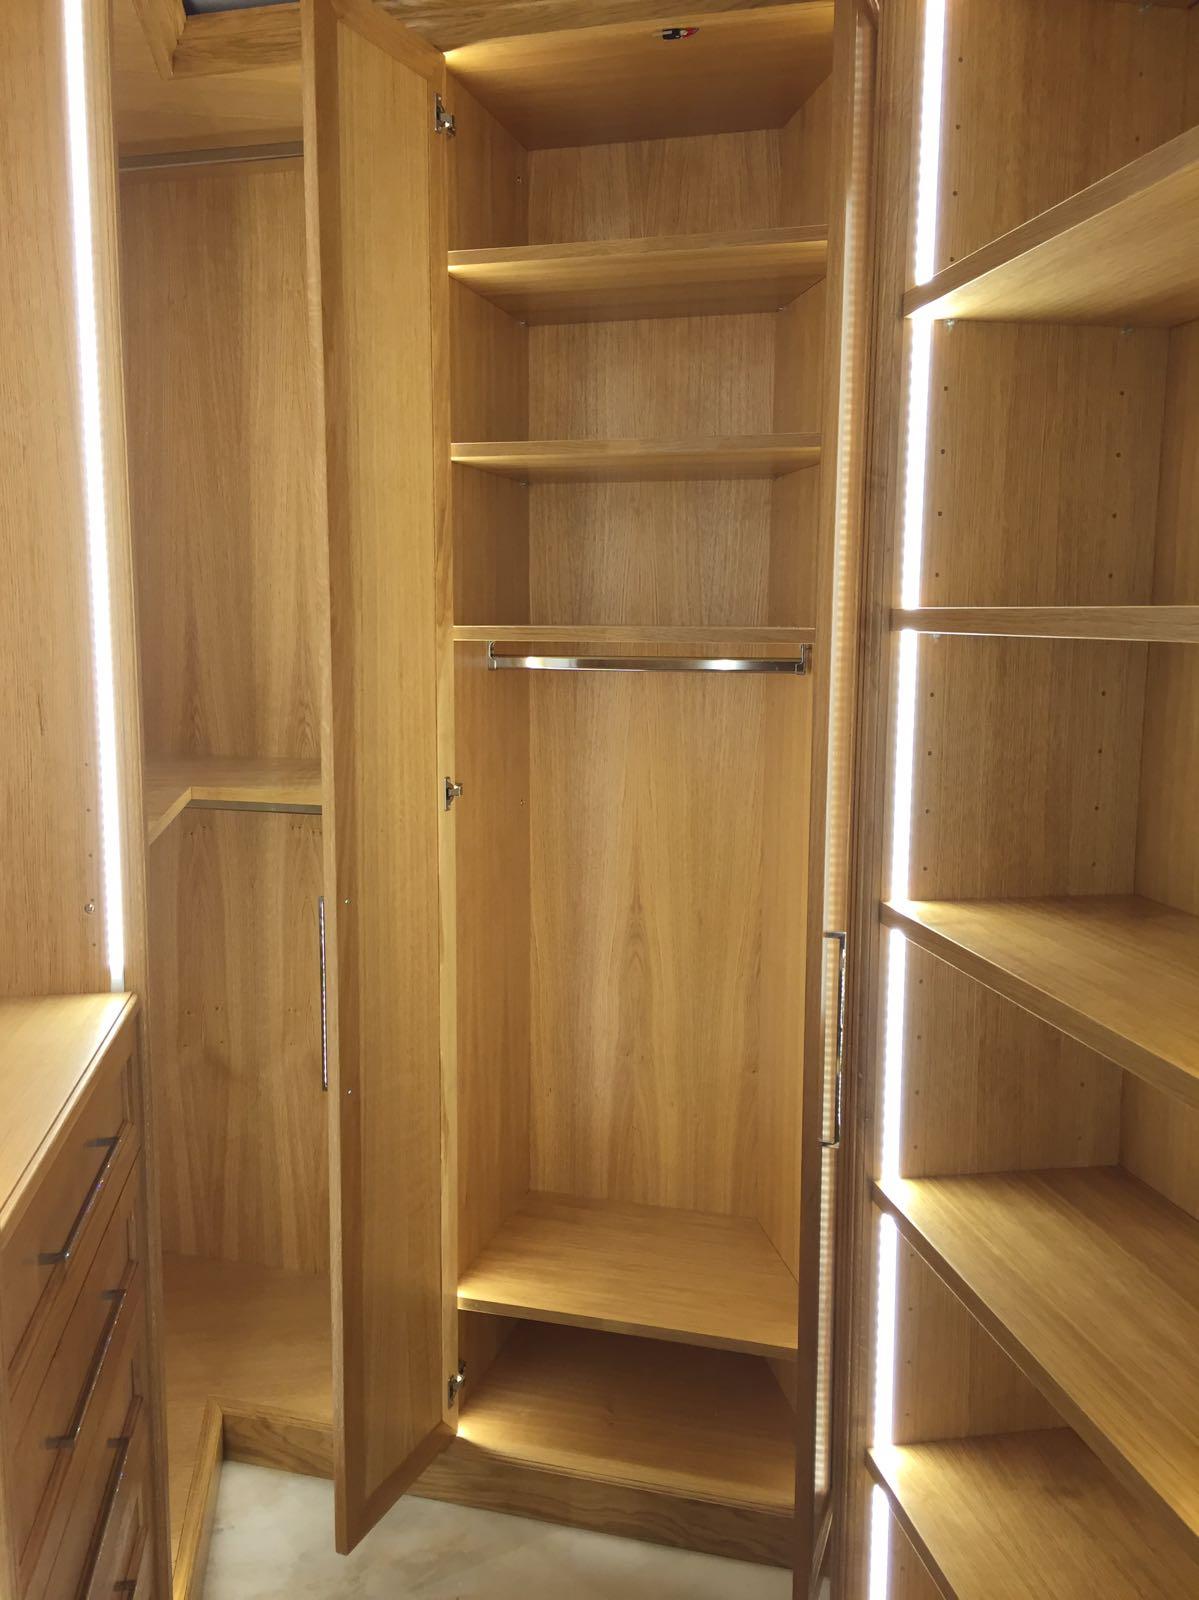 cabine armadio su misura